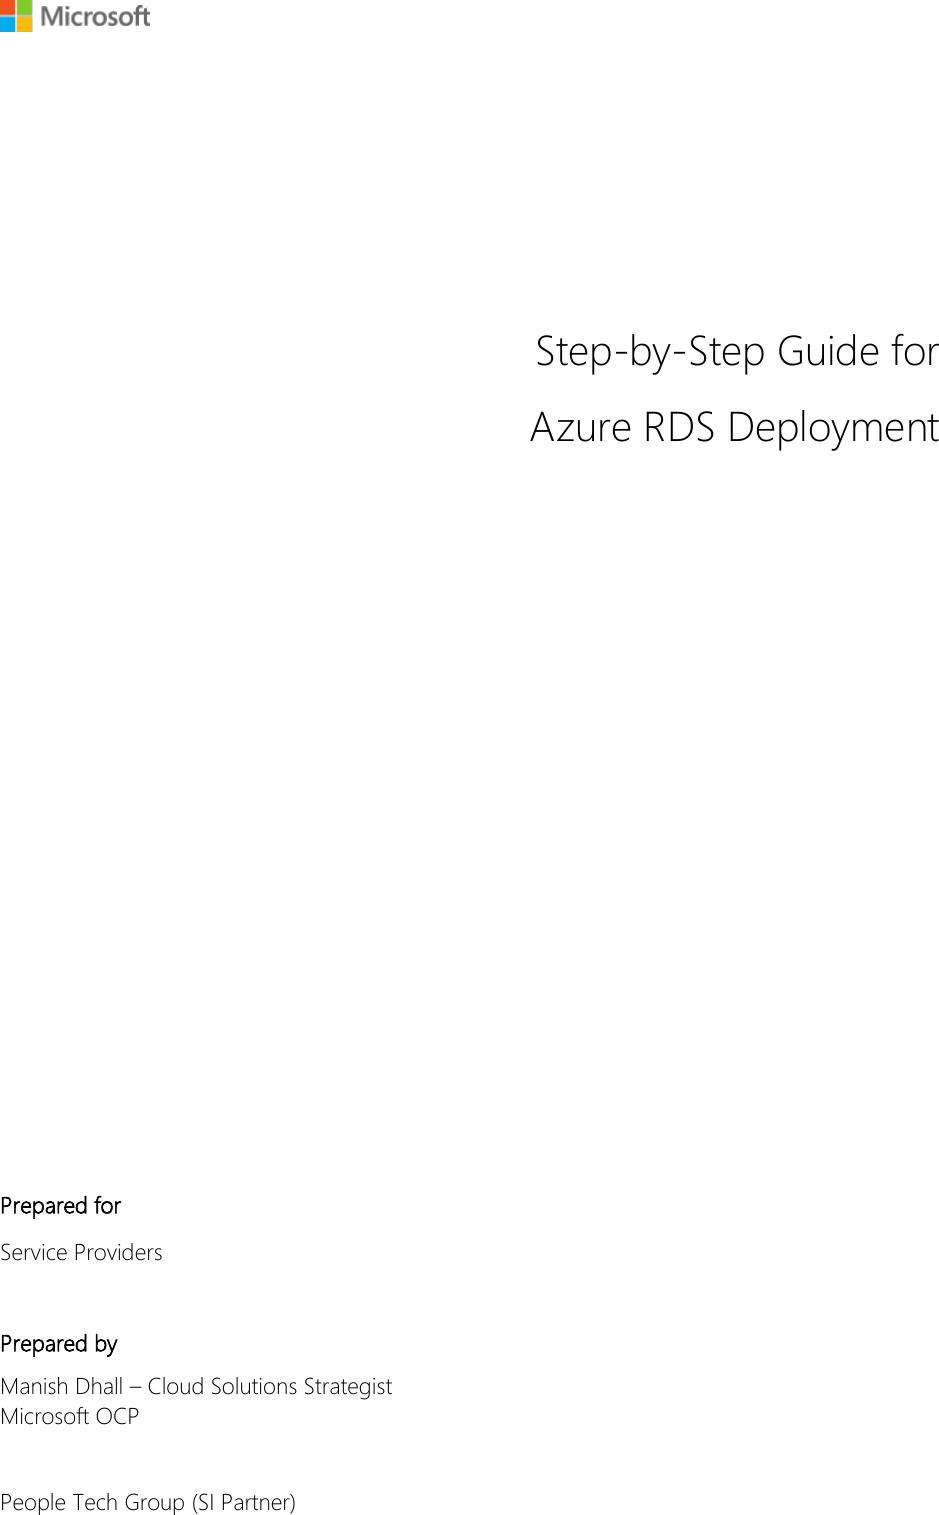 Azure RDS Deployment Guide